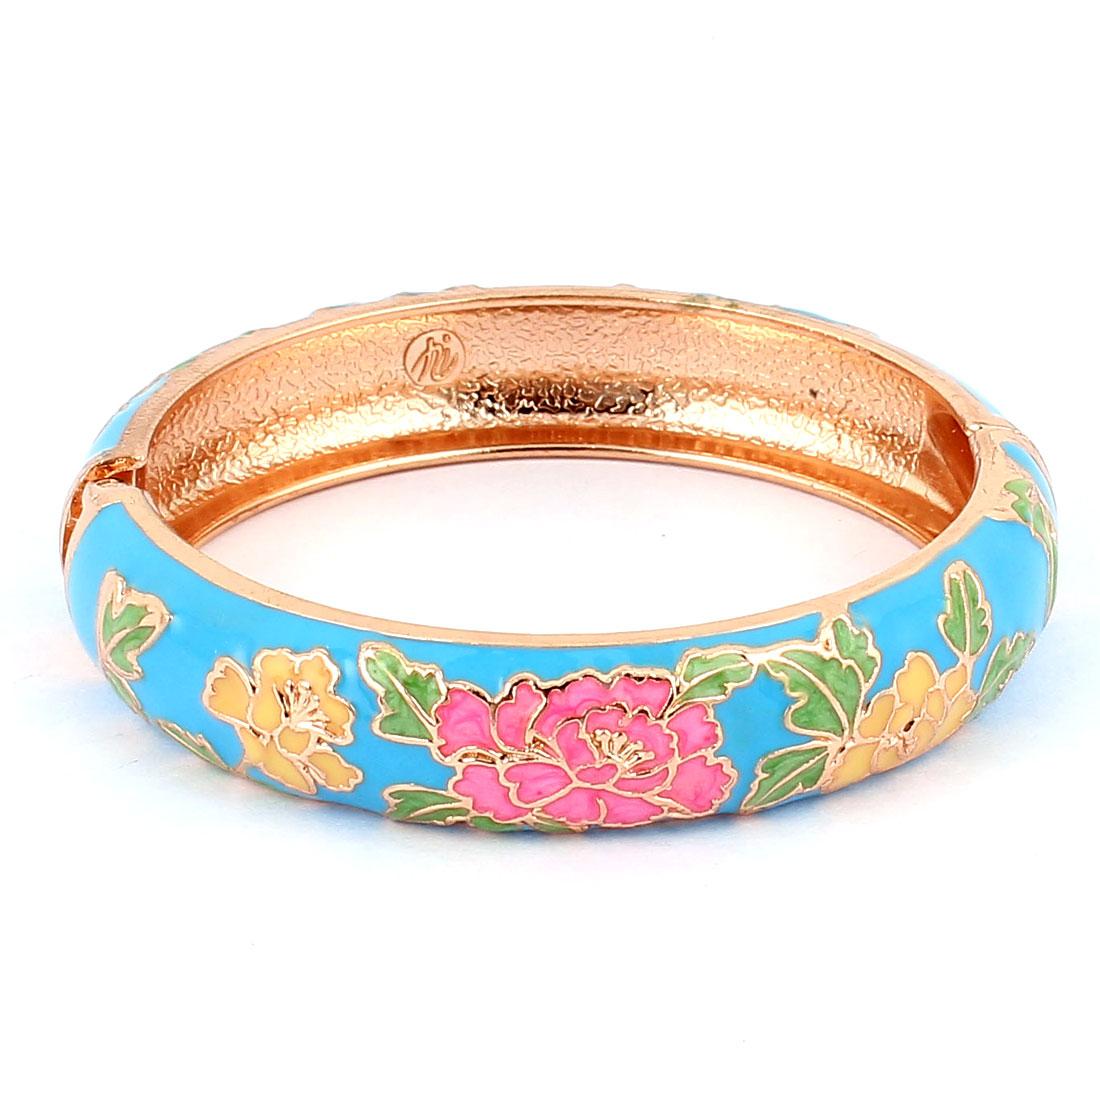 Women Floral Carved Enamel Hinged Bangle Bracelet Jewelry Blue